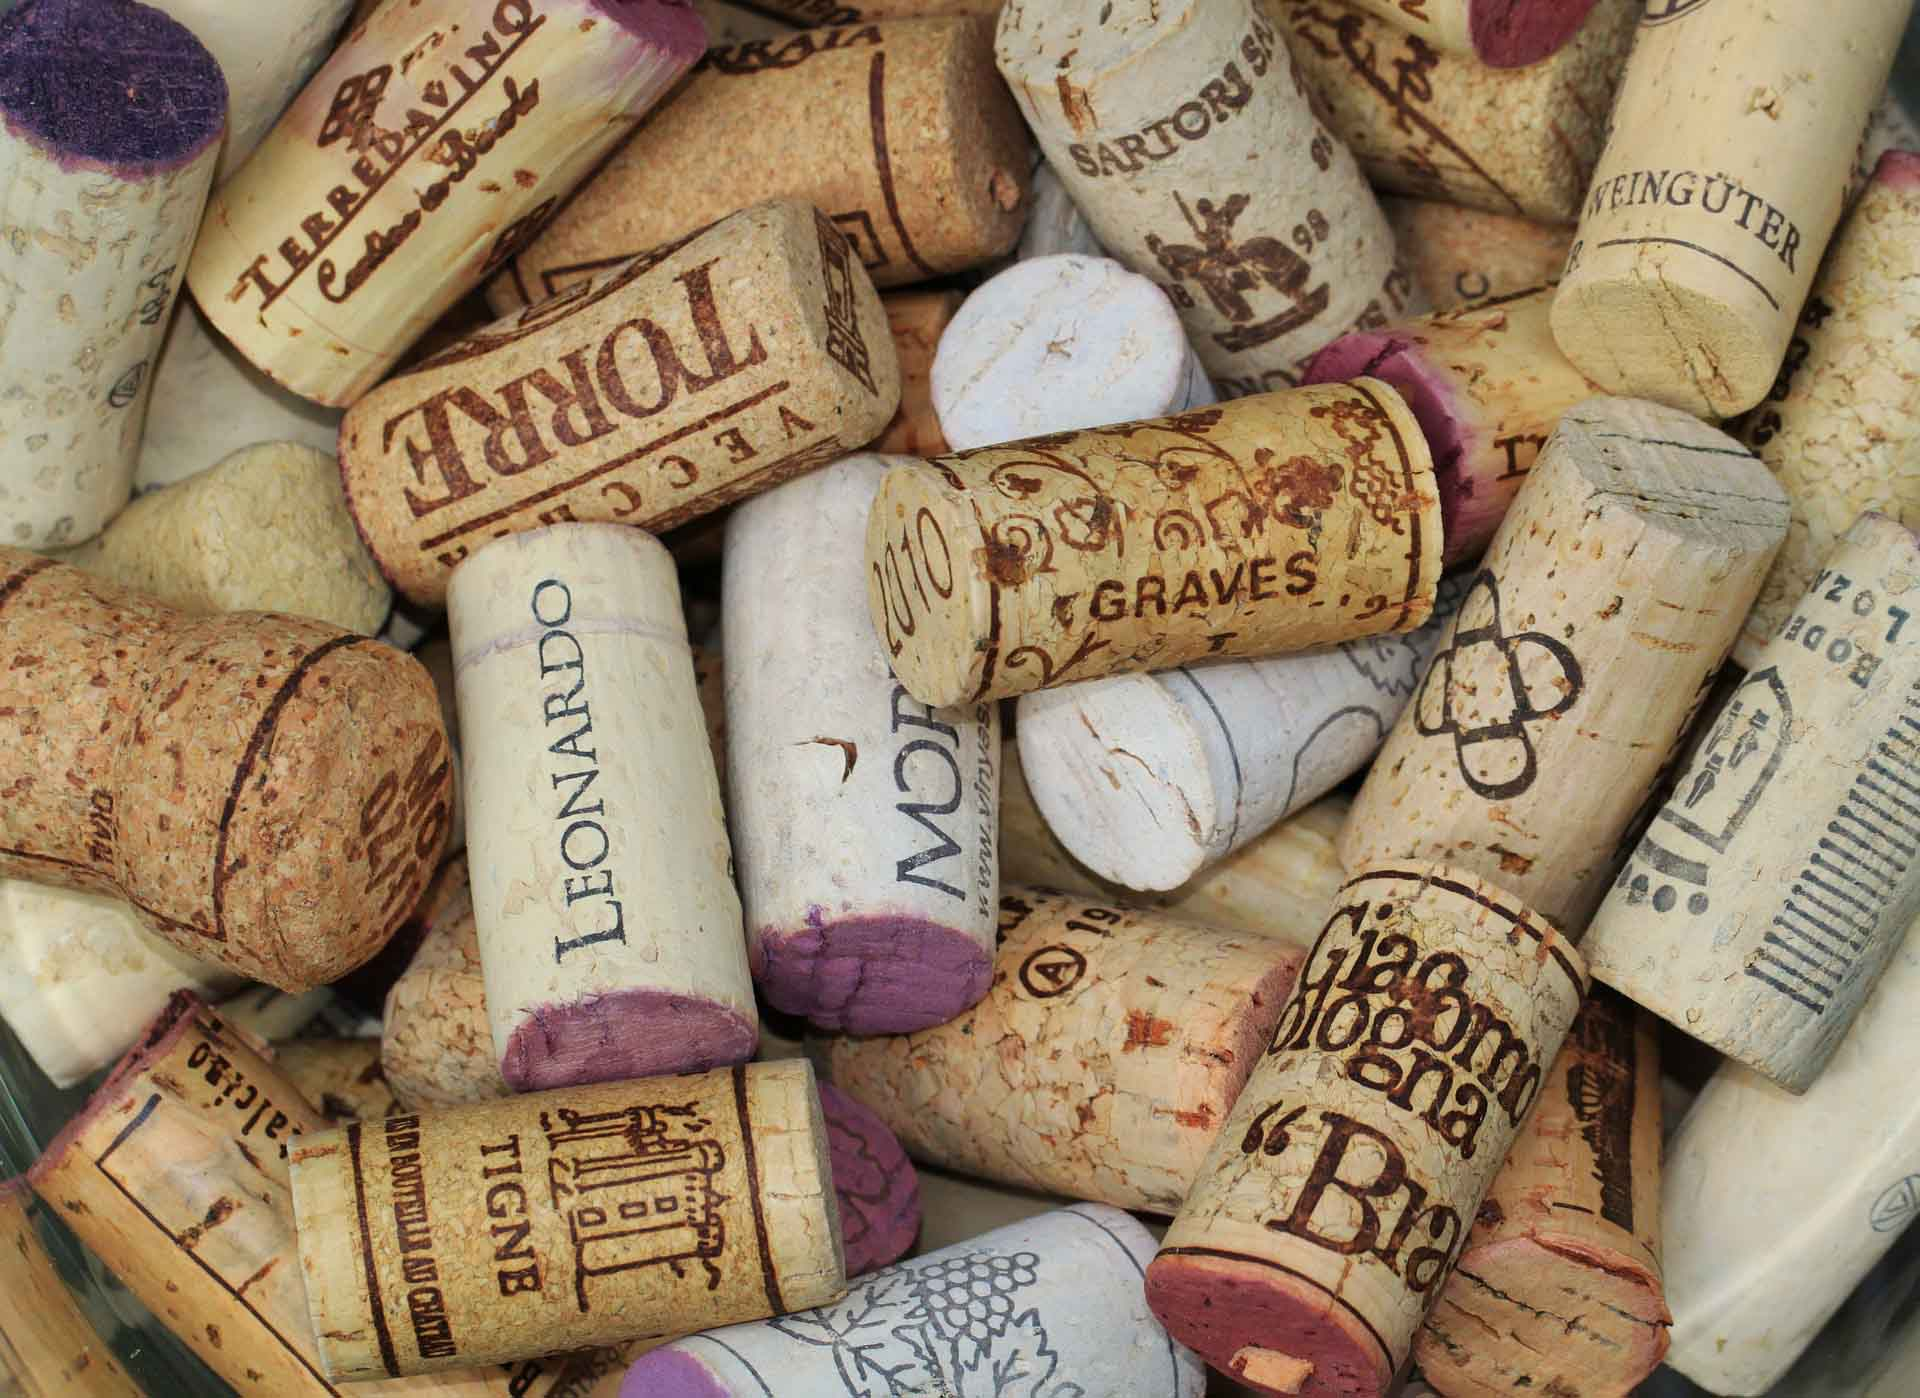 cork-collection-wine-confidante.jpg